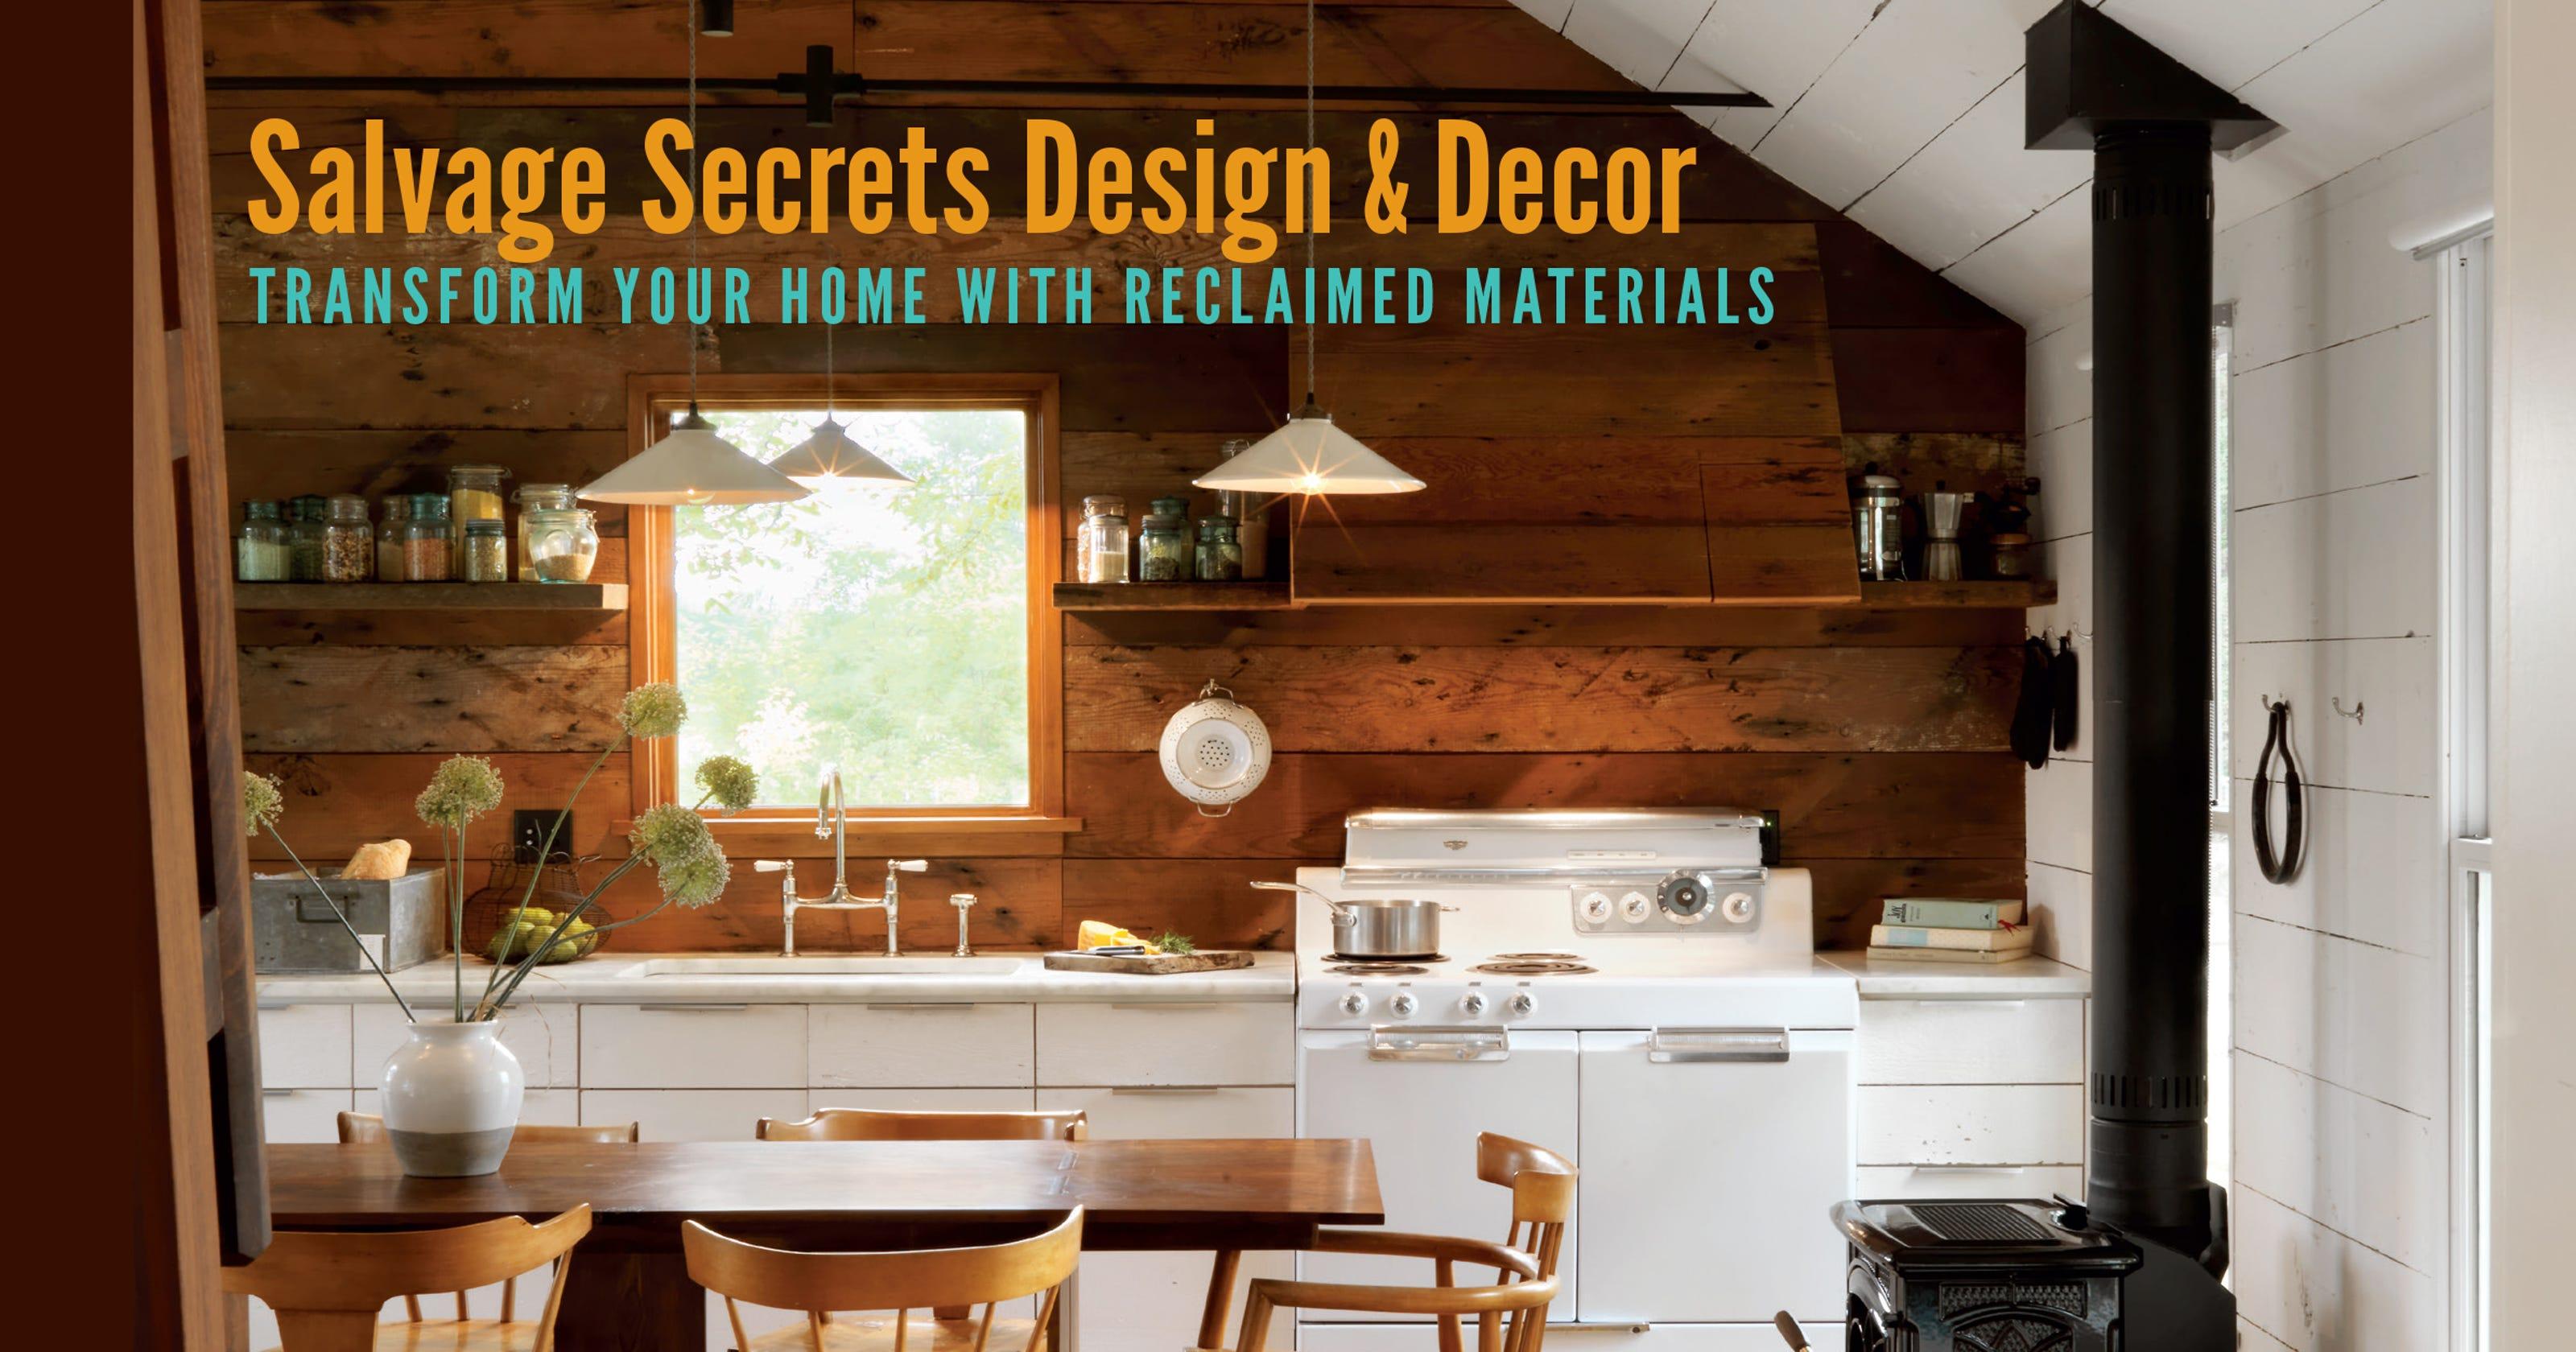 Arizona Homes Featured In Salvage Secrets Design Book